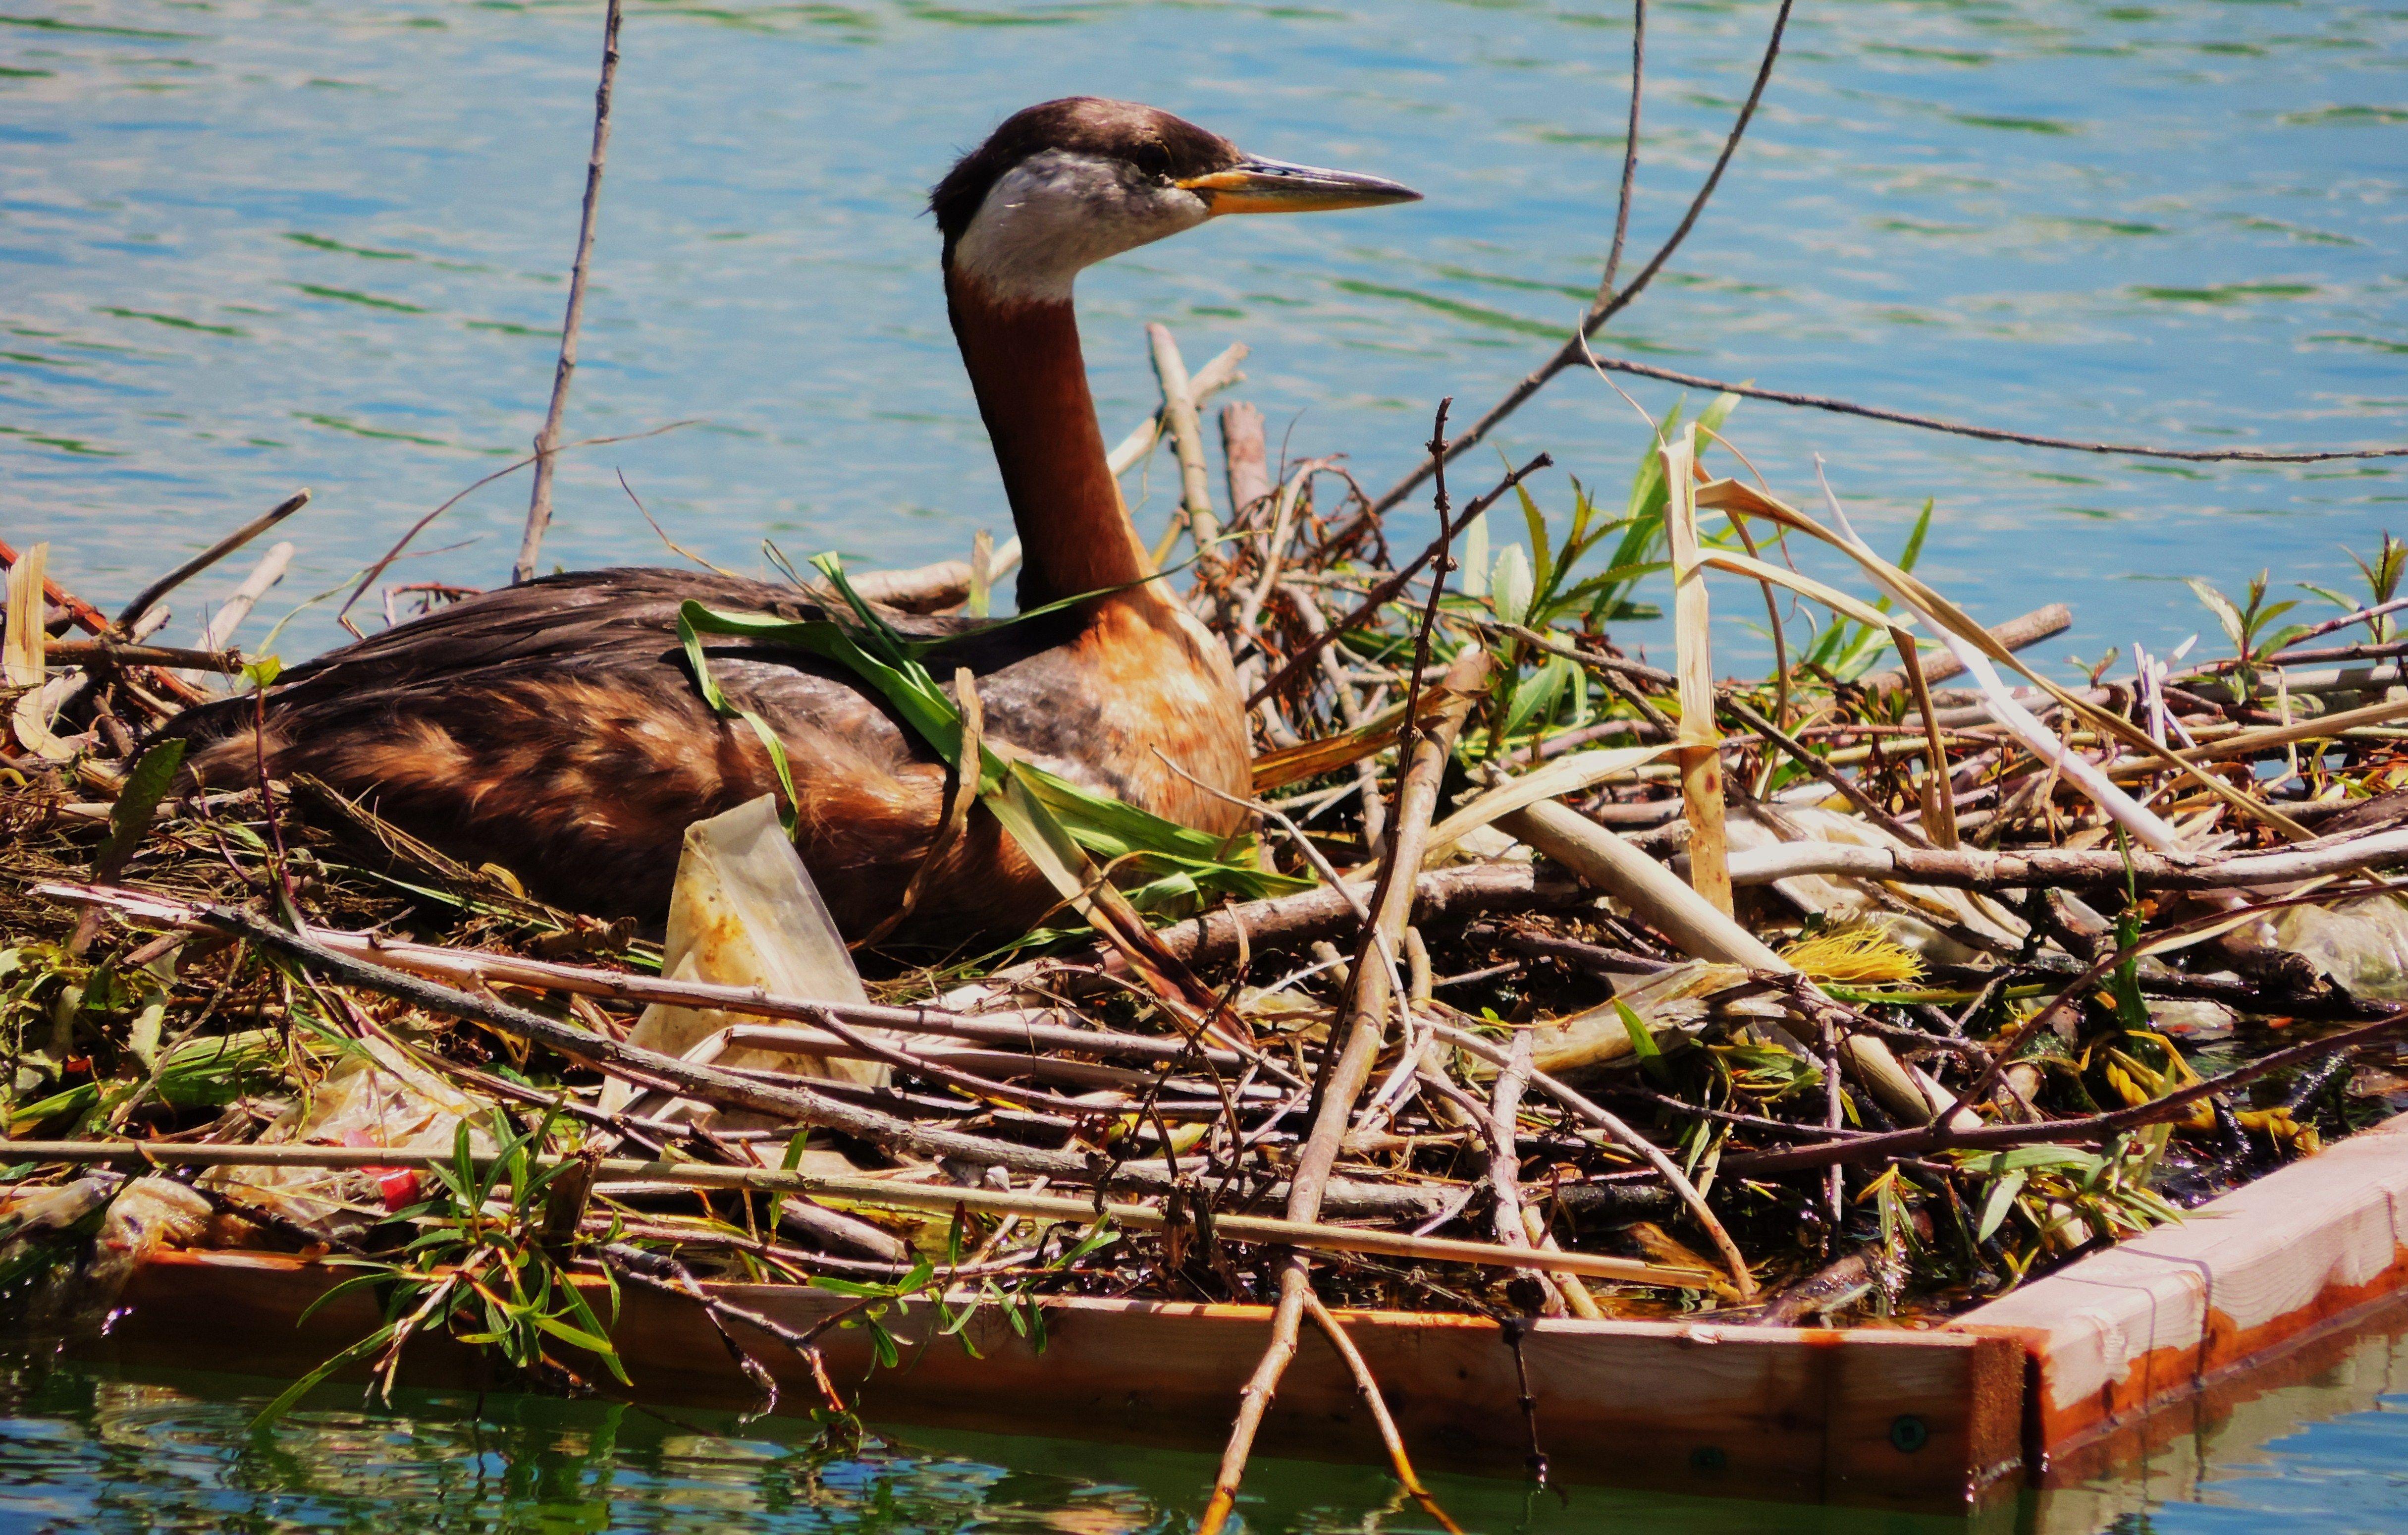 Female loon incubating.